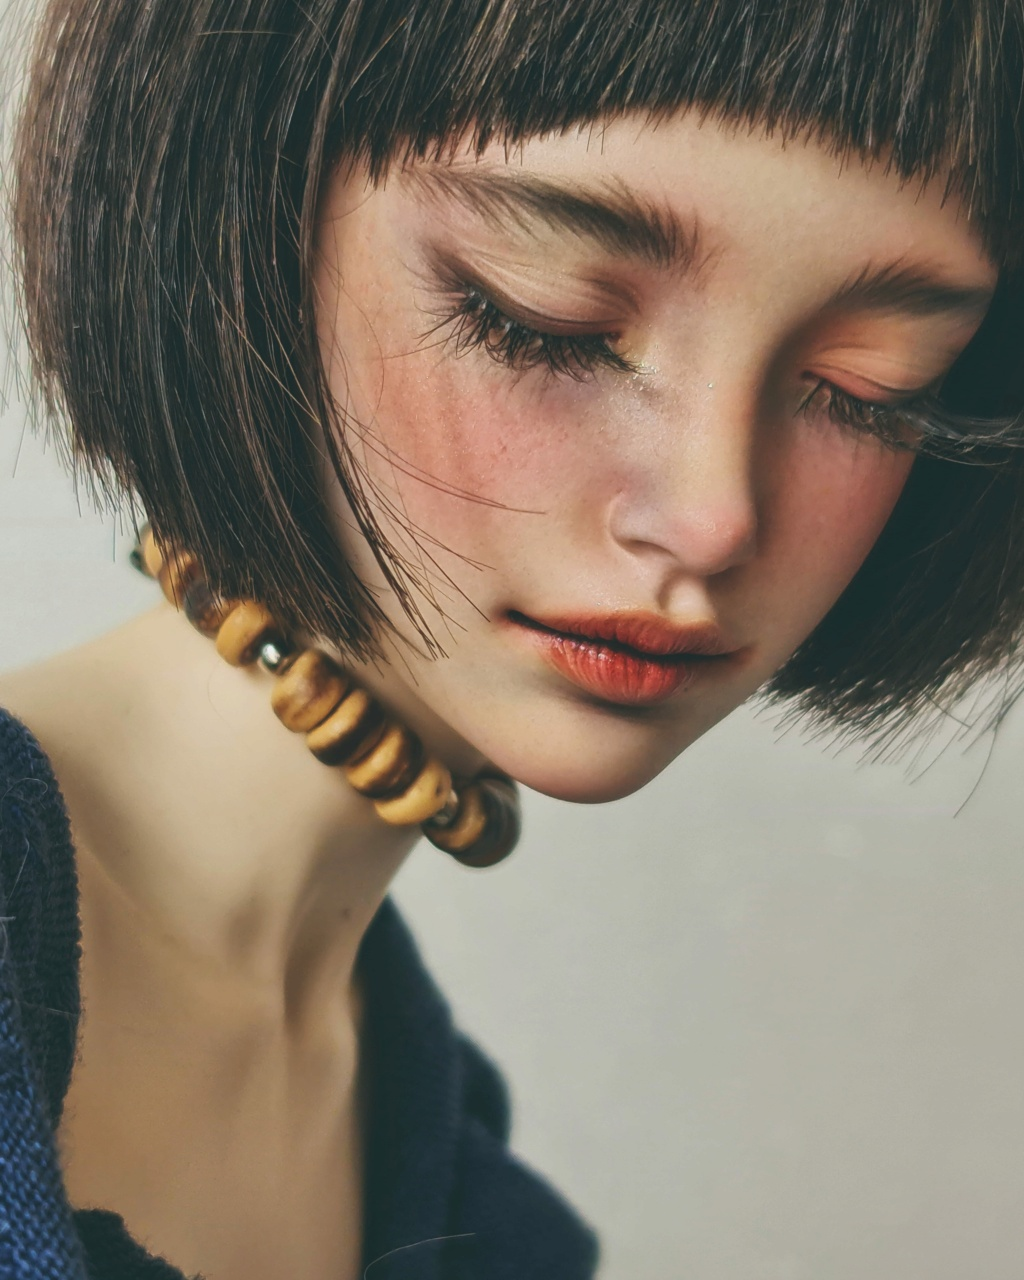 MEER 3.0 ( Natalia Loseva Zaya) up face plate sleeping P9 - Page 9 Img_2014